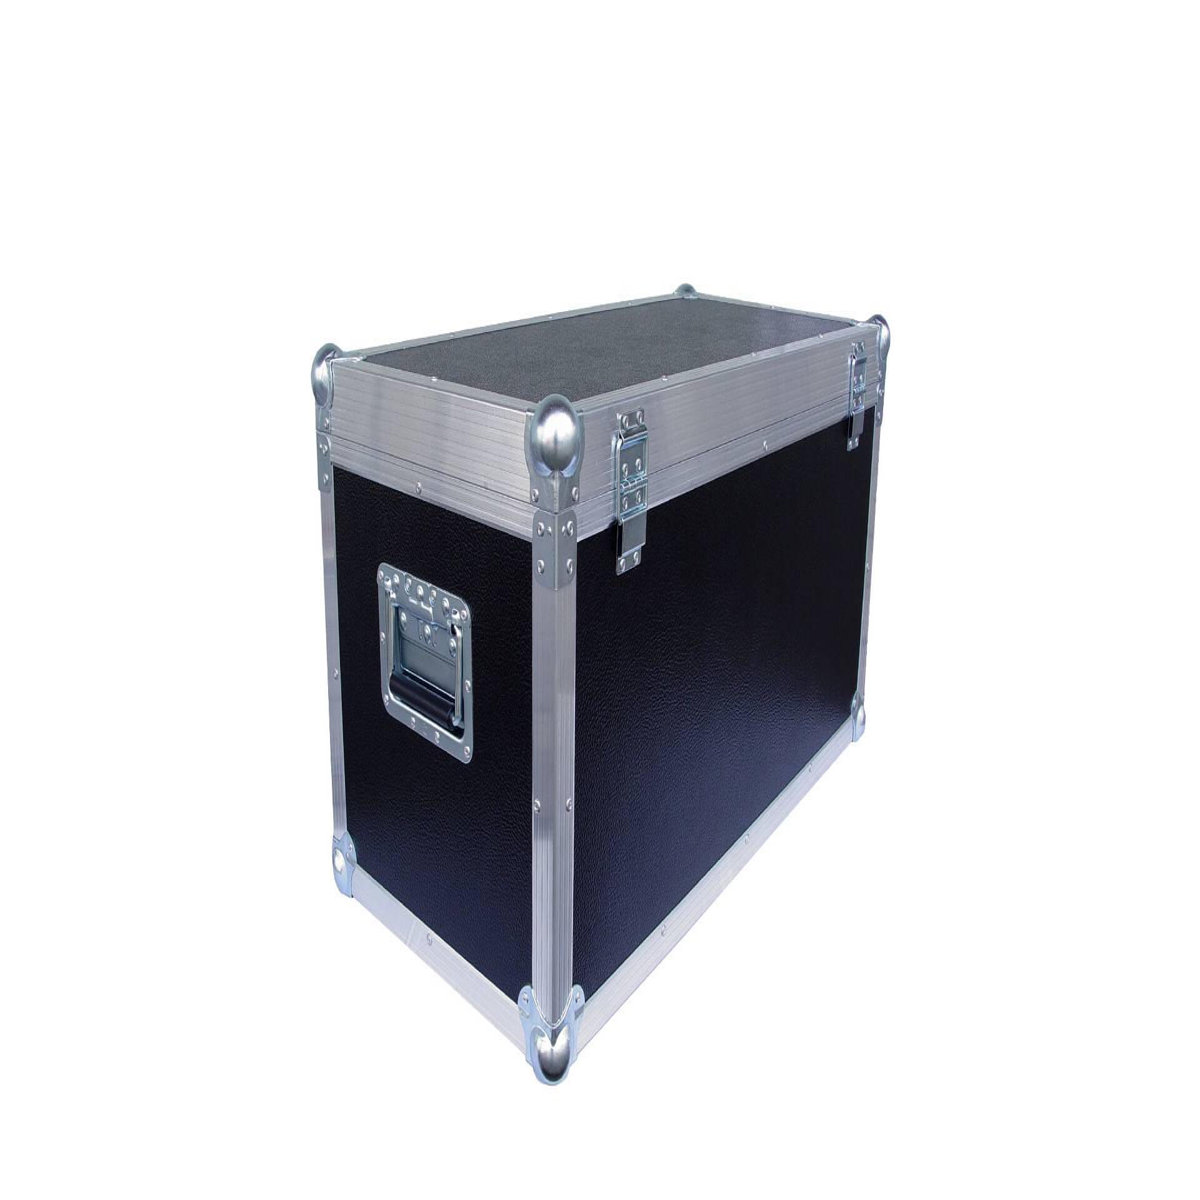 zubeh rcase truhencase 80x40x40 cm. Black Bedroom Furniture Sets. Home Design Ideas